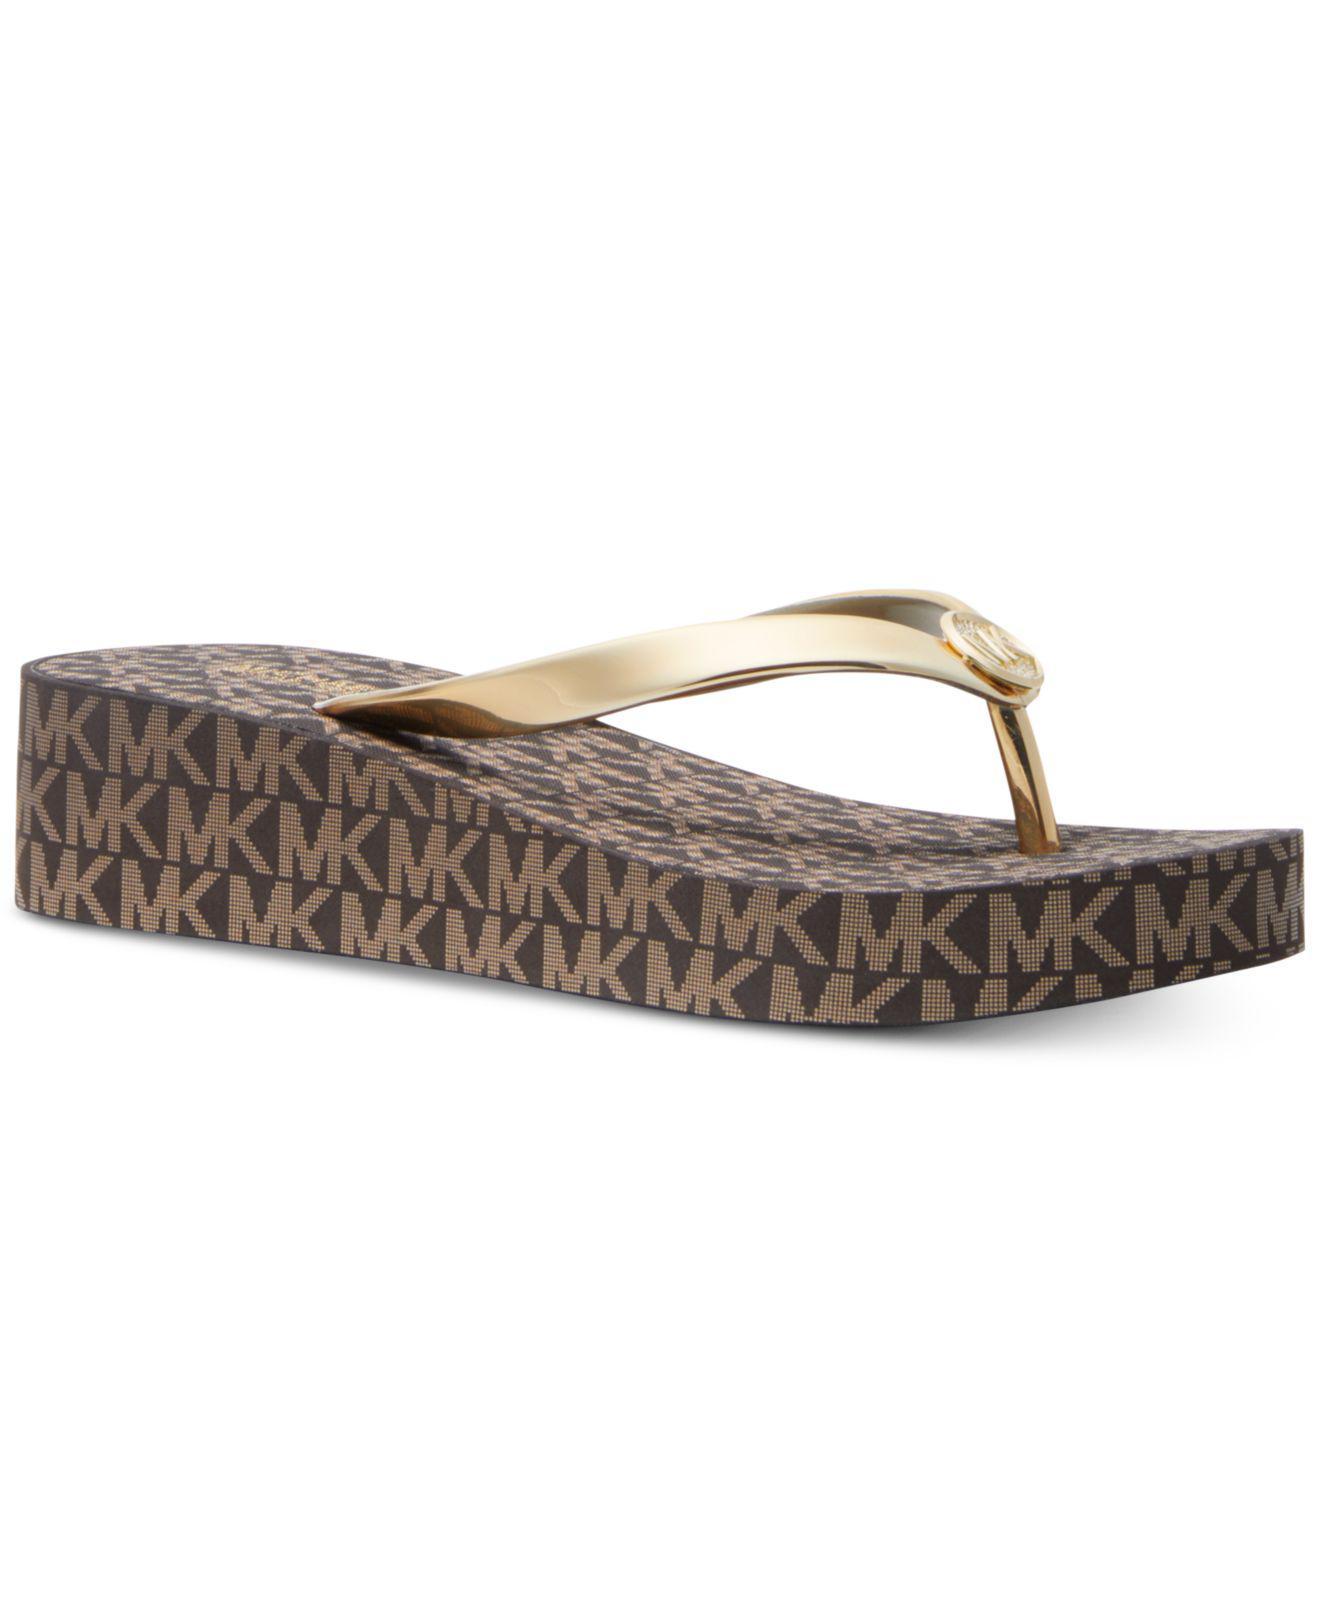 16cb1d772bfa7 Michael Kors Michael Bedford Flip-flop Sandals in Metallic - Lyst